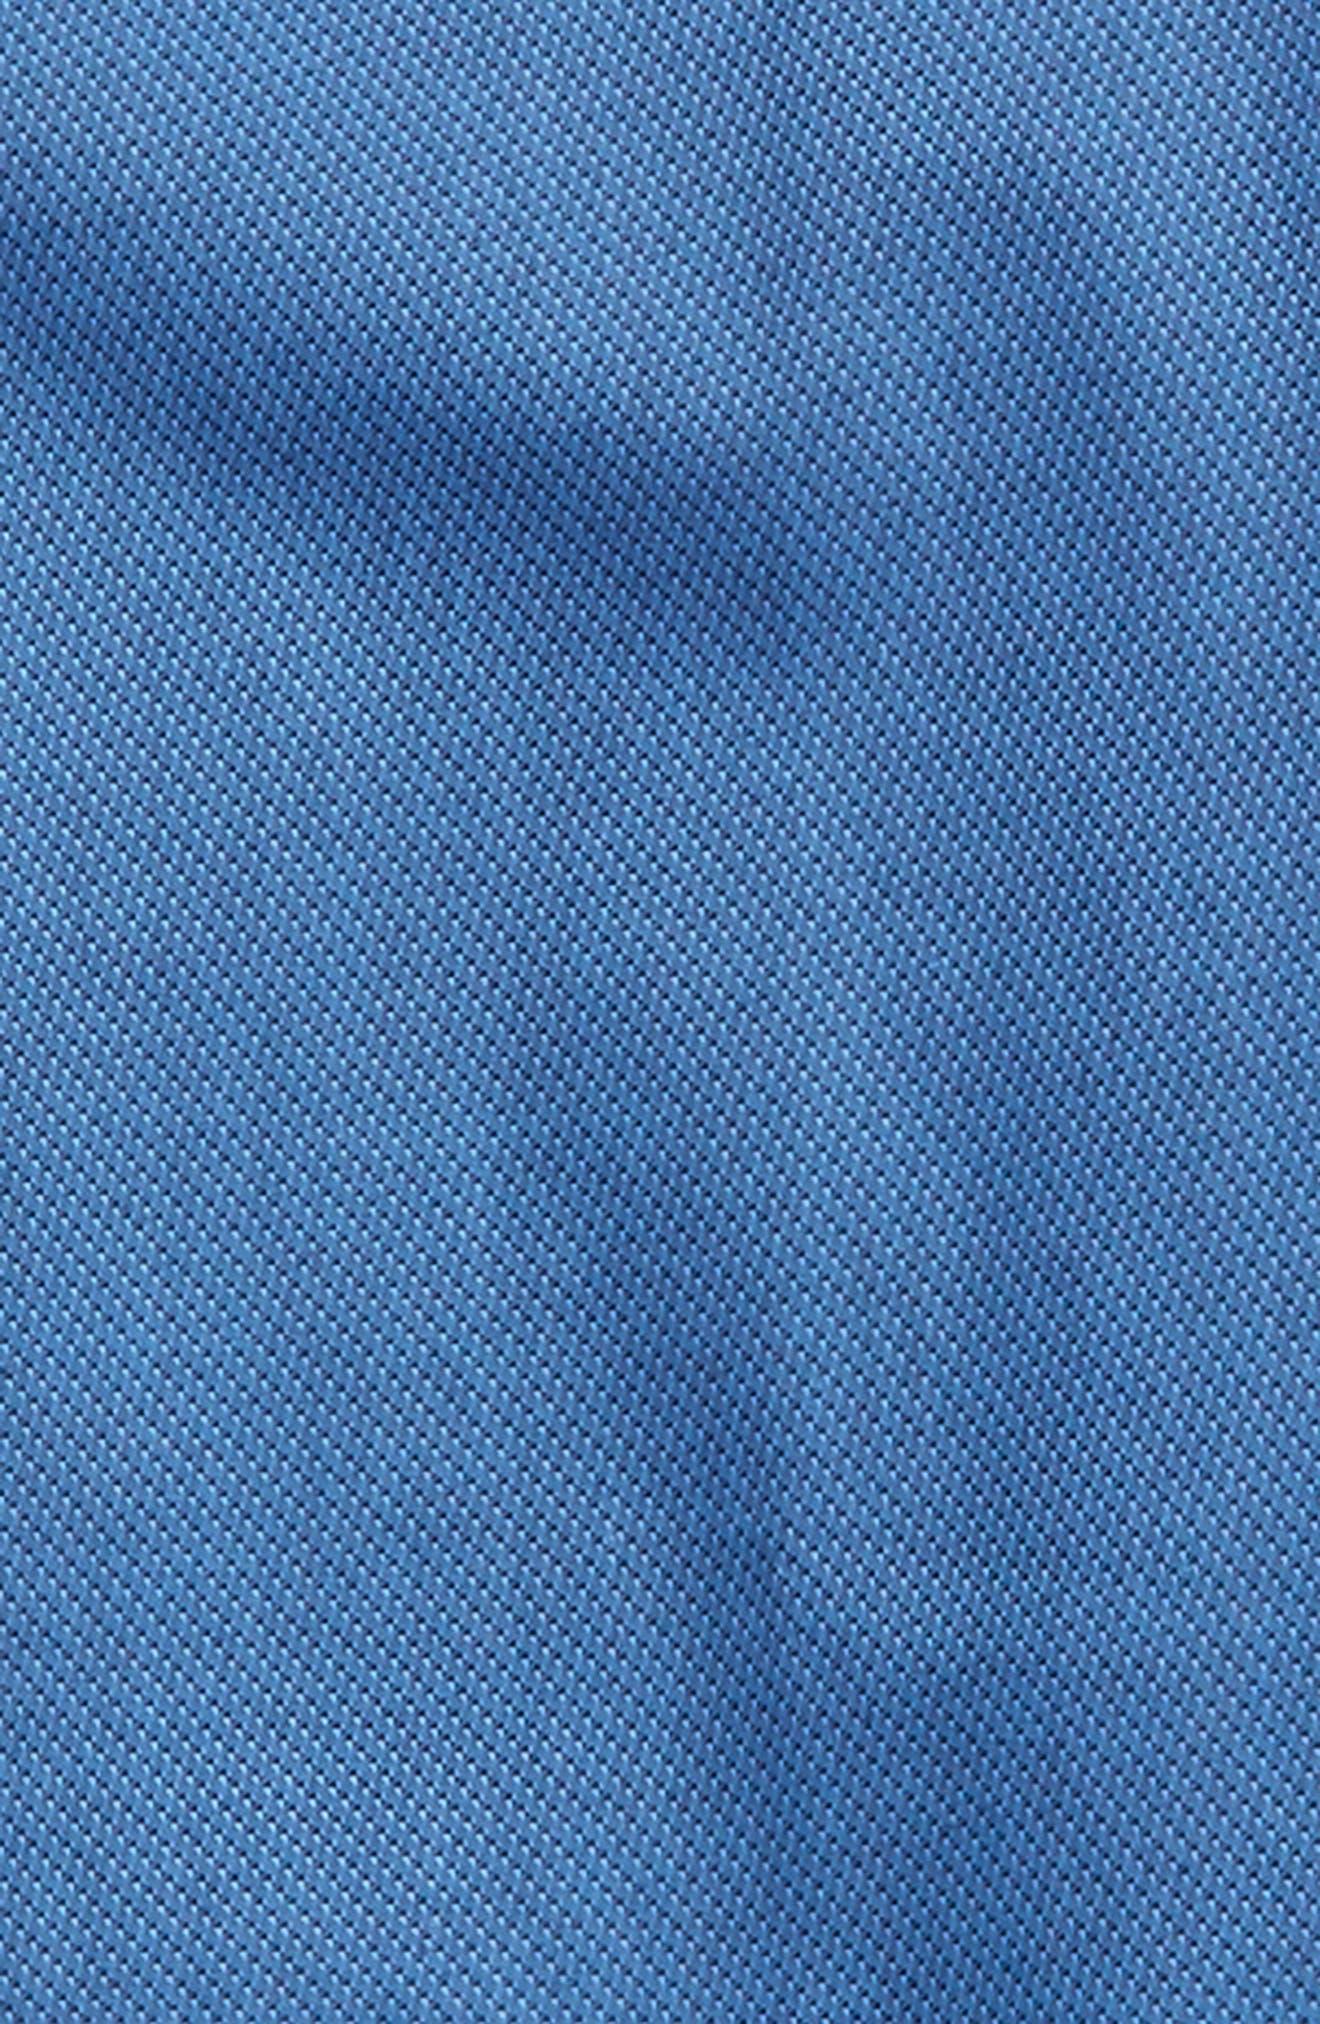 Alternate Image 2  - DKNY Textured Dress Shirt (Big Boys)